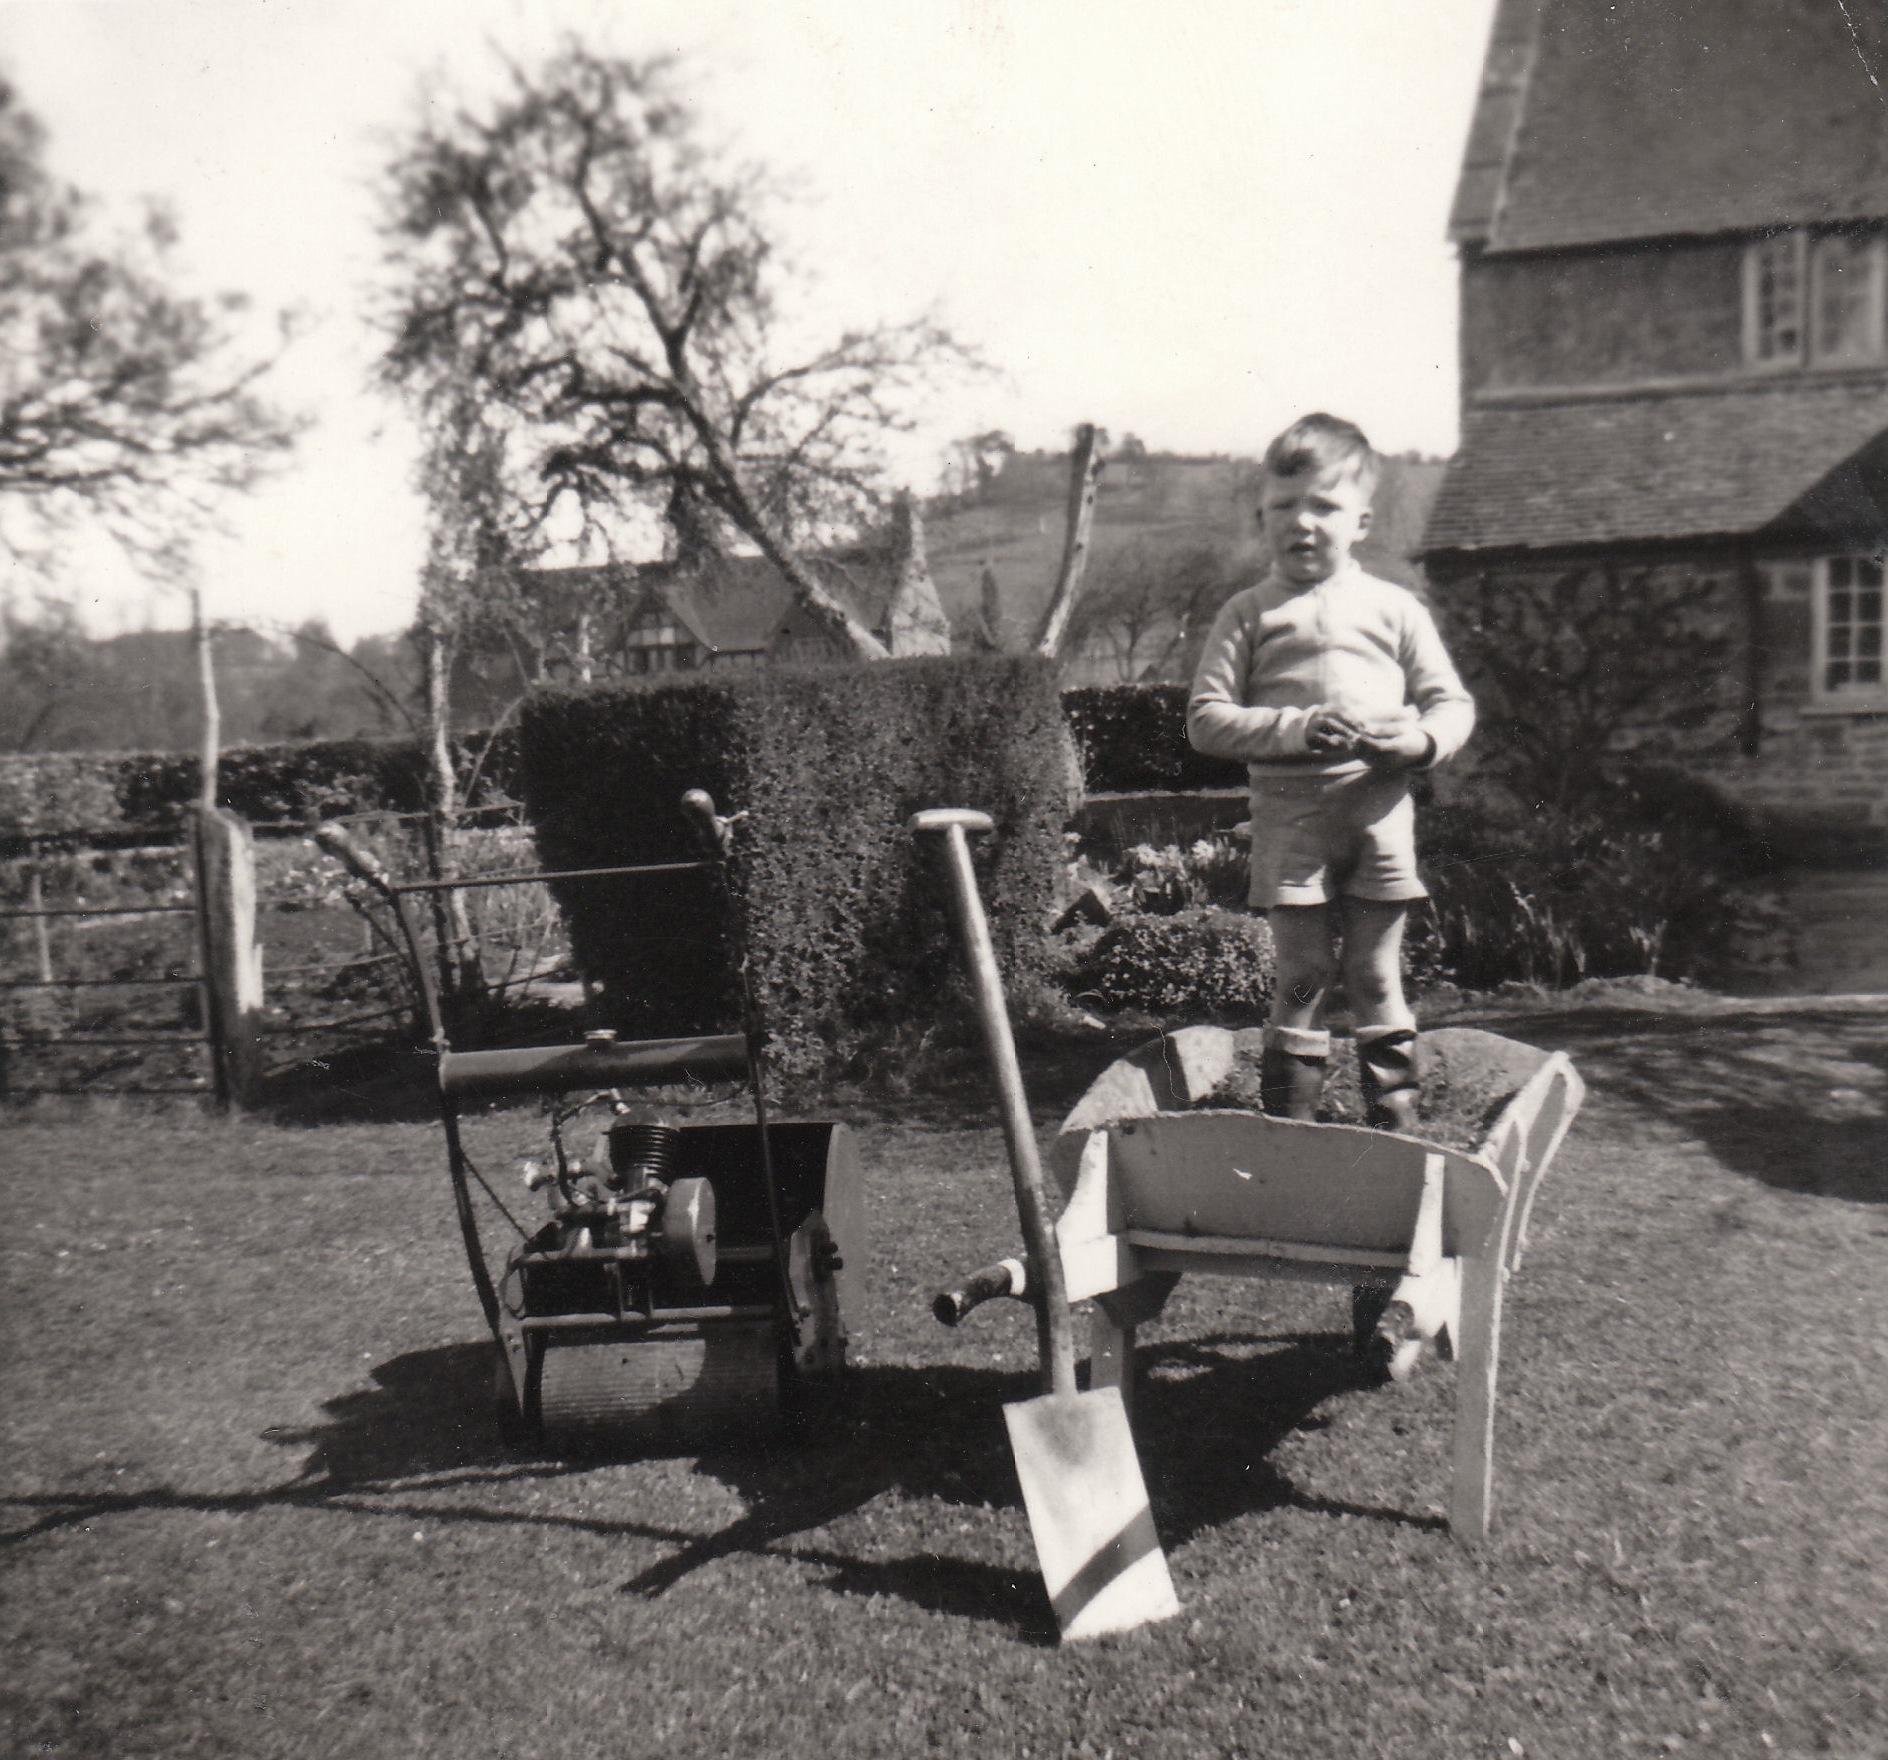 Roger with grandad's spade